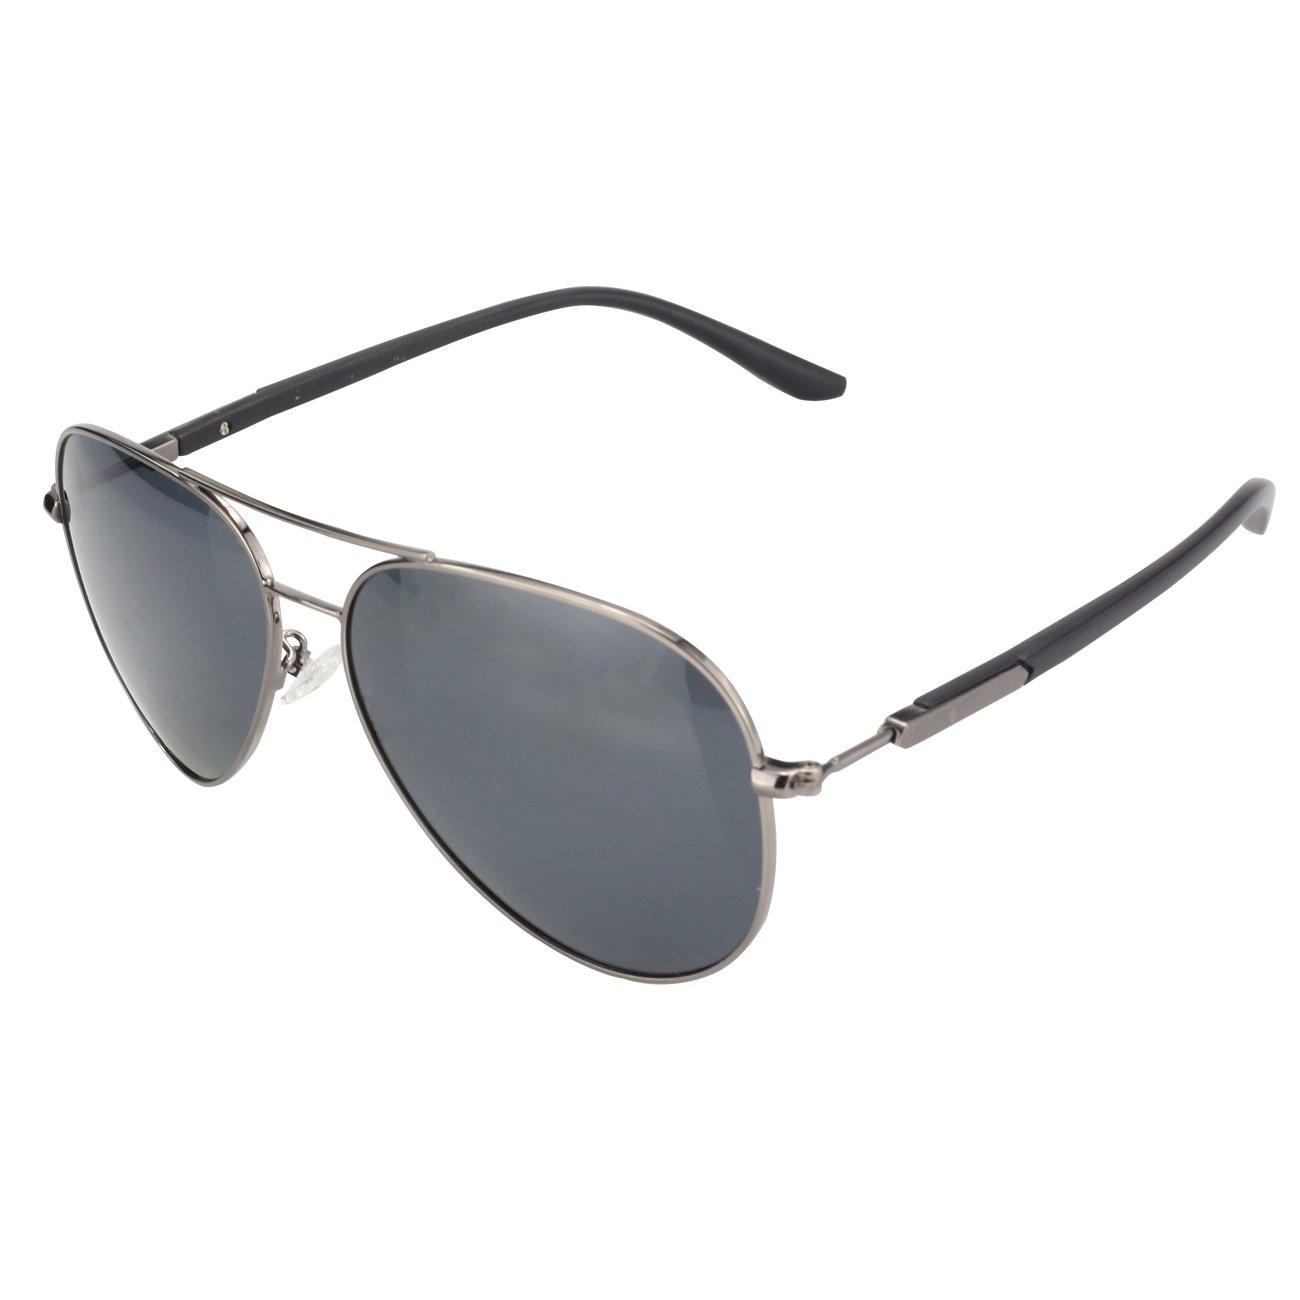 DUCO Premium Pilot Style Polarized Sunglasses 100% UV protection for Men Women 3027 (Gunmetal) by DUCO